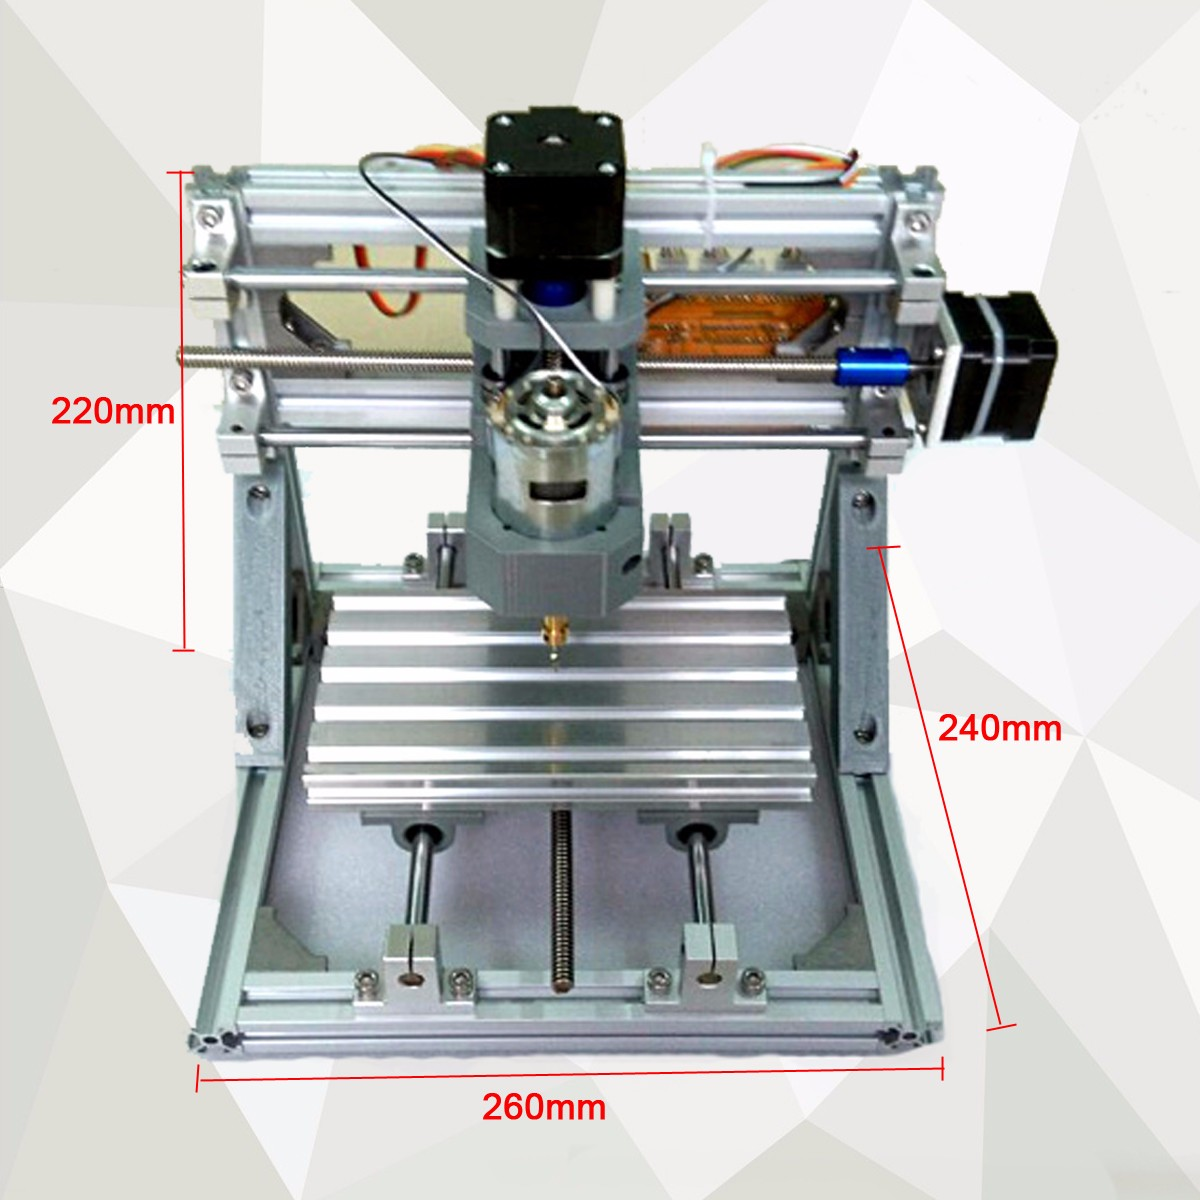 Mini 3 grabador láser máquina cc 12V DIY cortador de madera de escritorio/impresora/potencia ajustable con cabezal láser de 500MW - 4